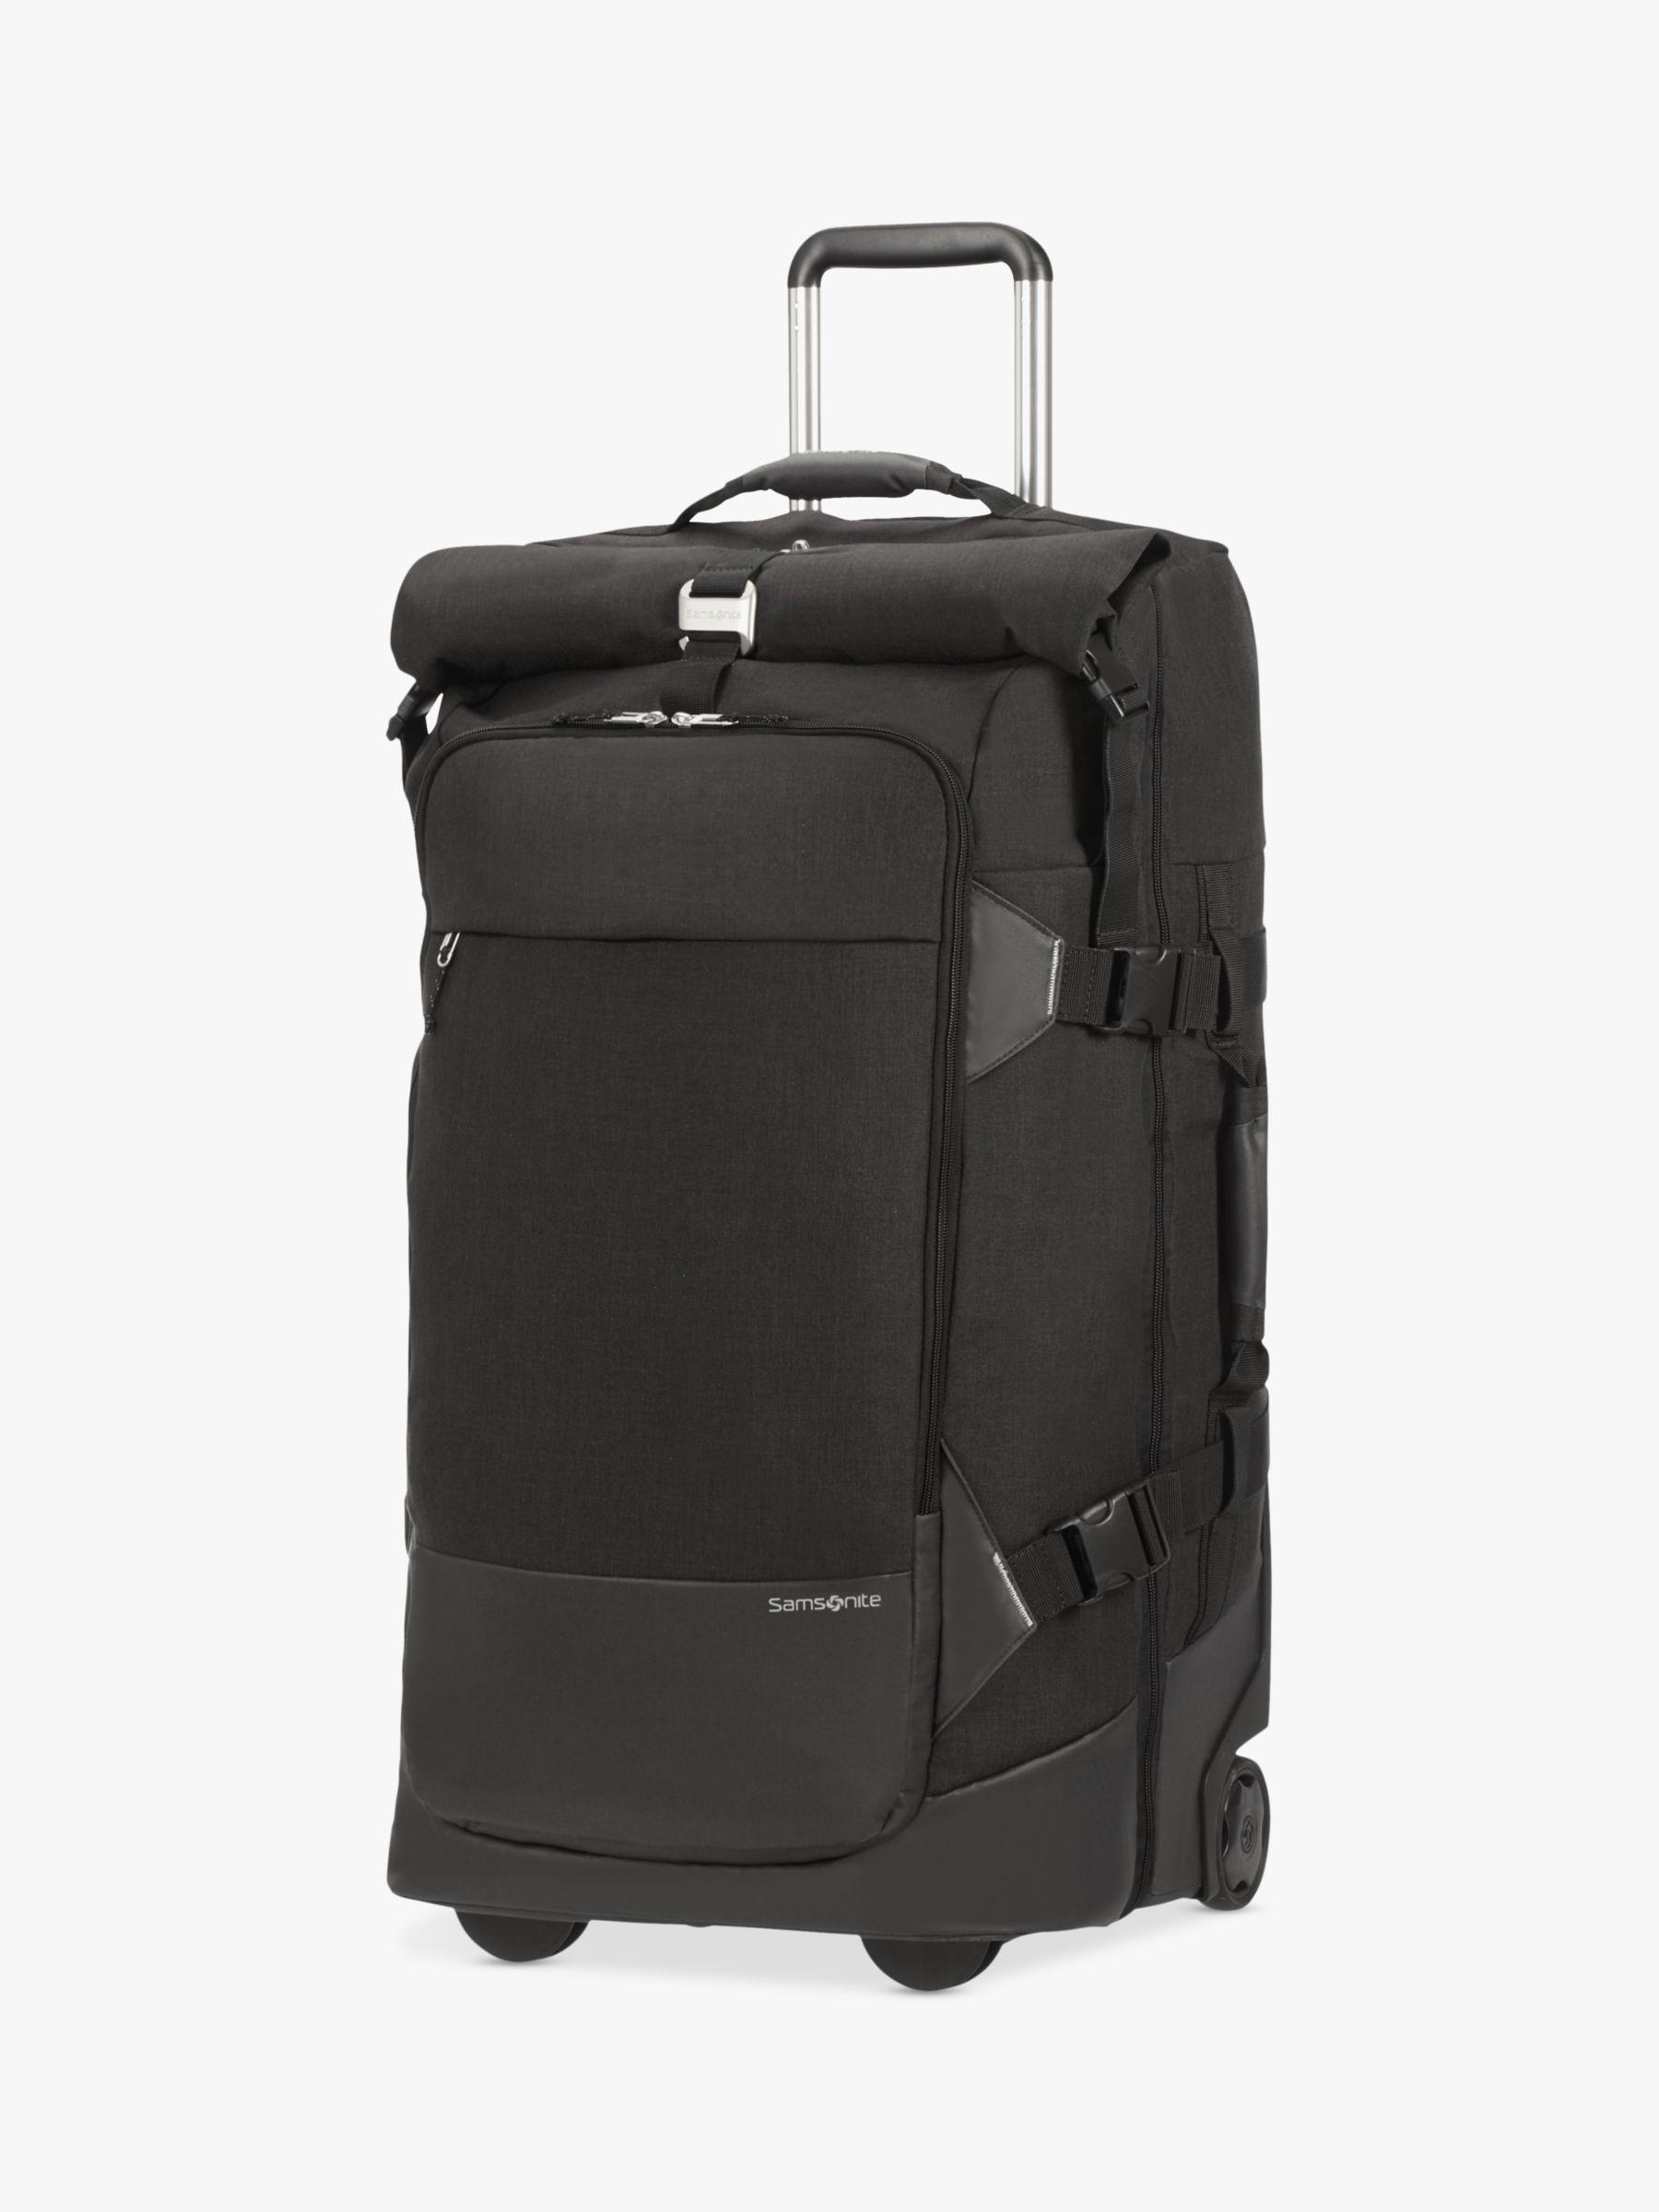 Samsonite - Black Ziproll Recycled 75cm 2-wheel Duffle Bag for Men - Lyst.  View fullscreen 3bbee5b00d